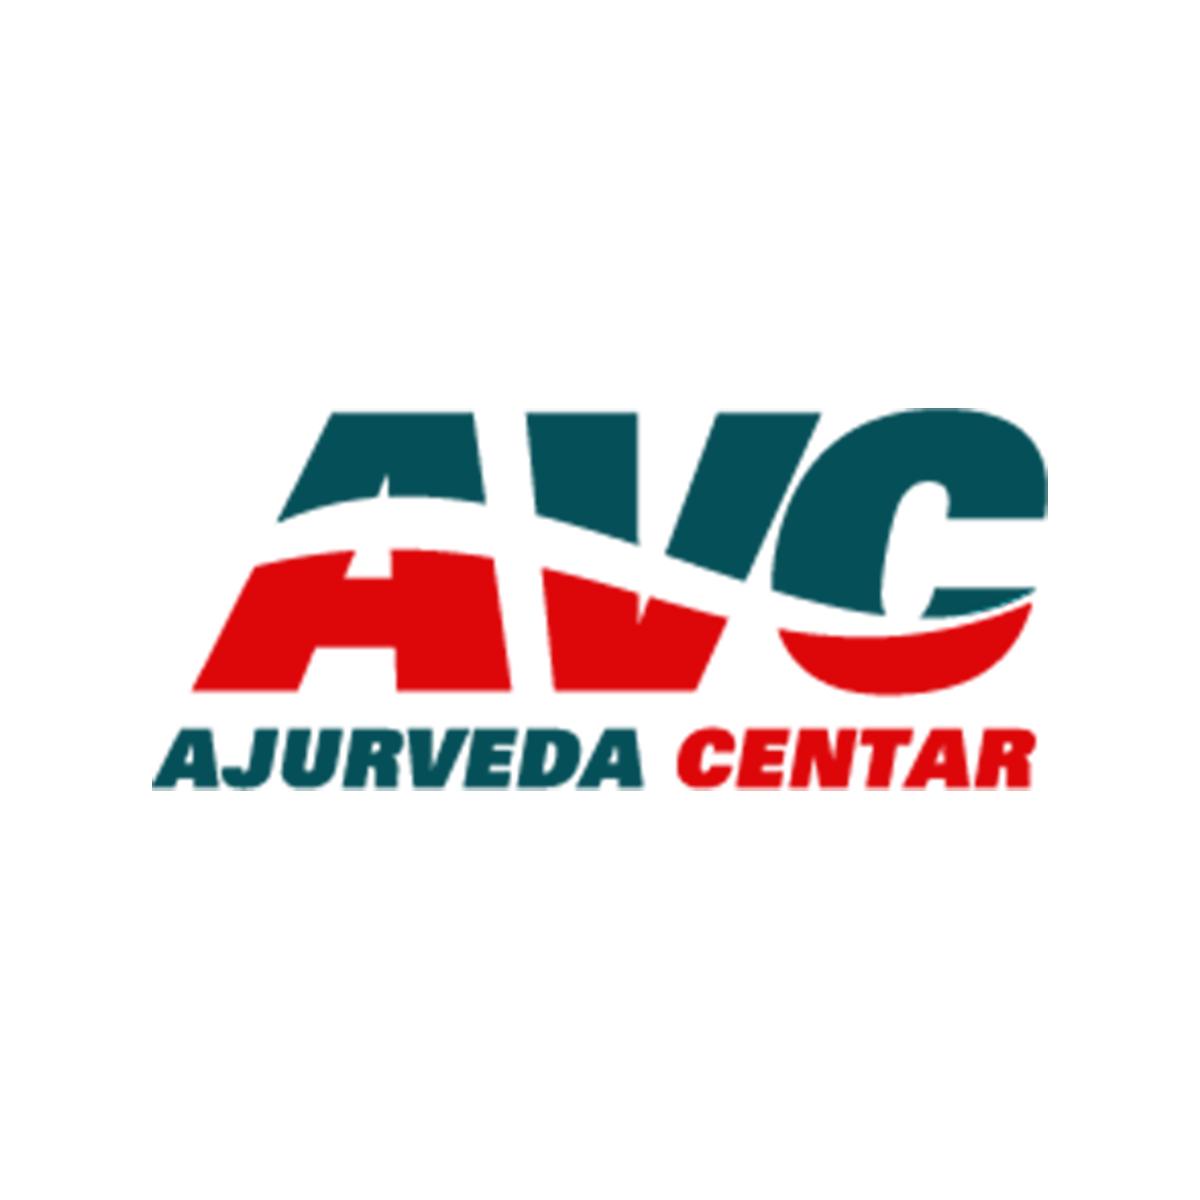 Ajurveda centar